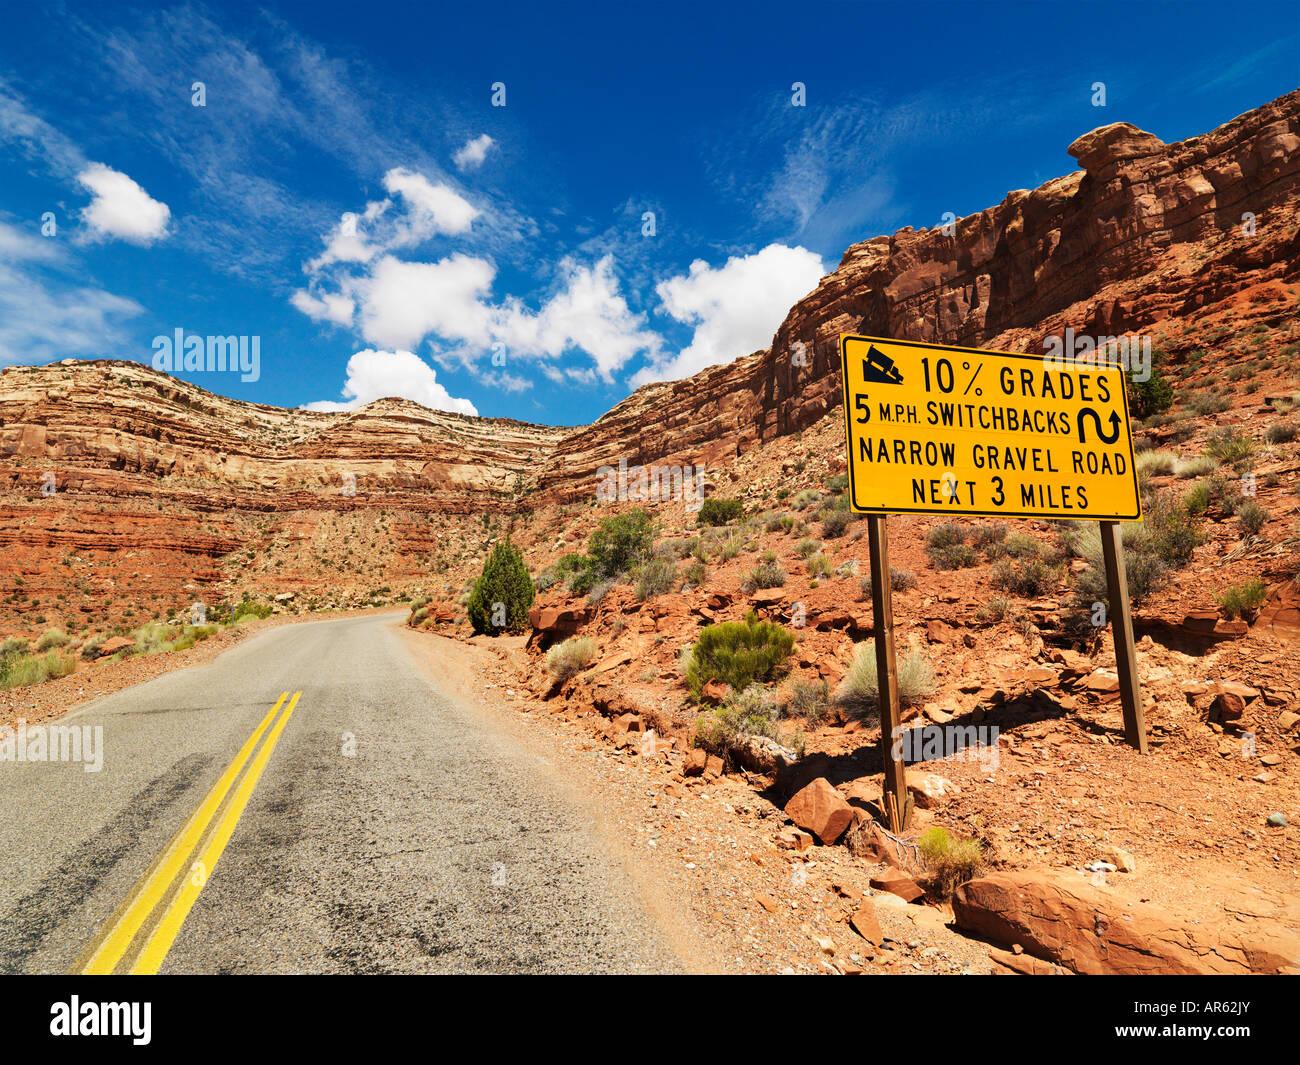 Road sign warning steep grade through rocky Utah landscape - Stock Image